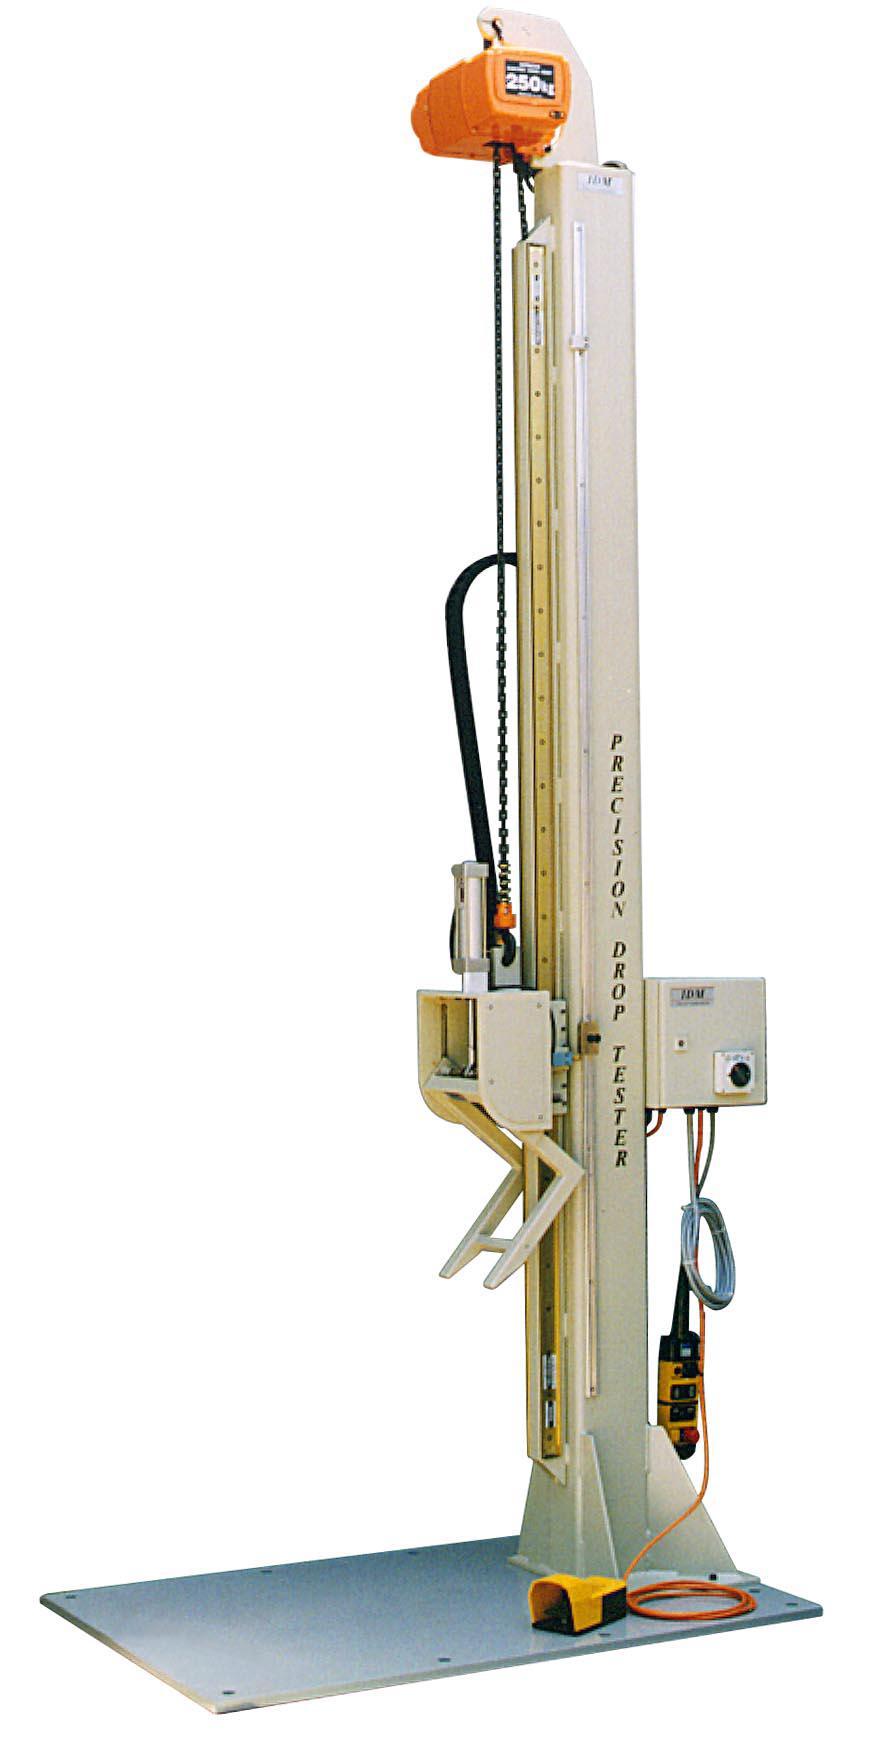 P0003&P0007 – precision drop testers